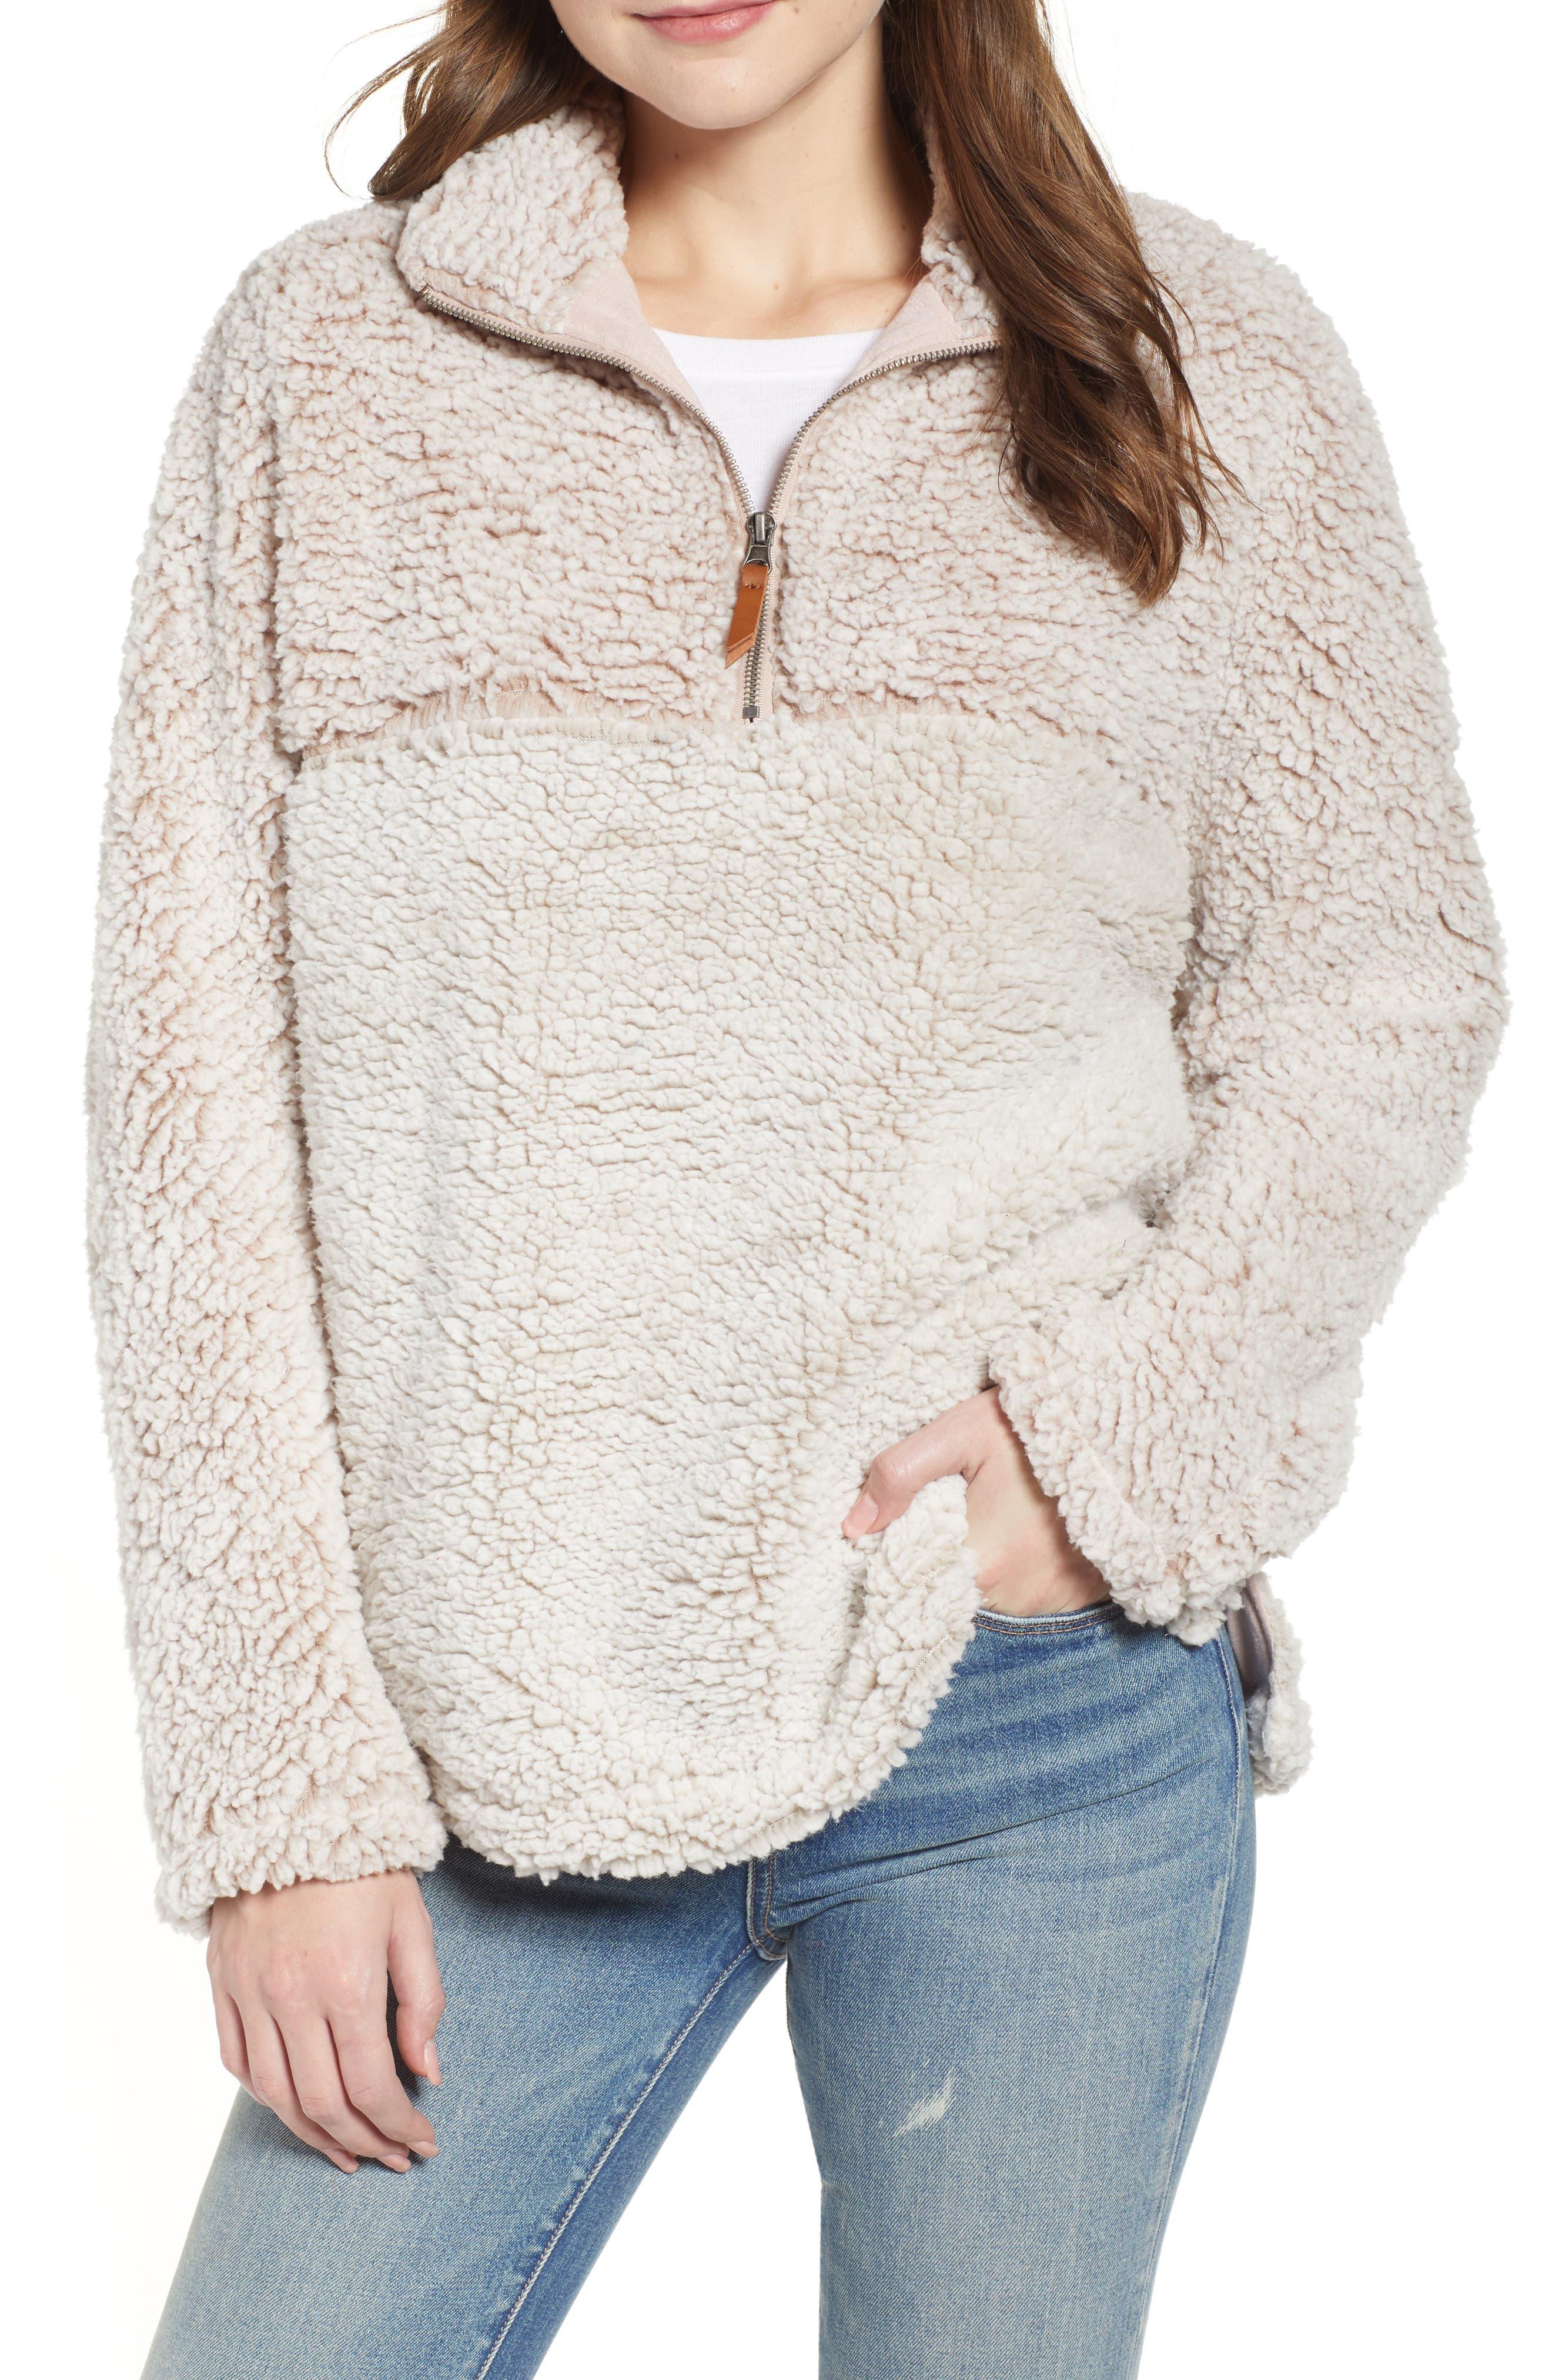 THREAD & SUPPLY Colorblock Wubby Fleece Pullover, Main, color, SMOKE ROSE IVORY